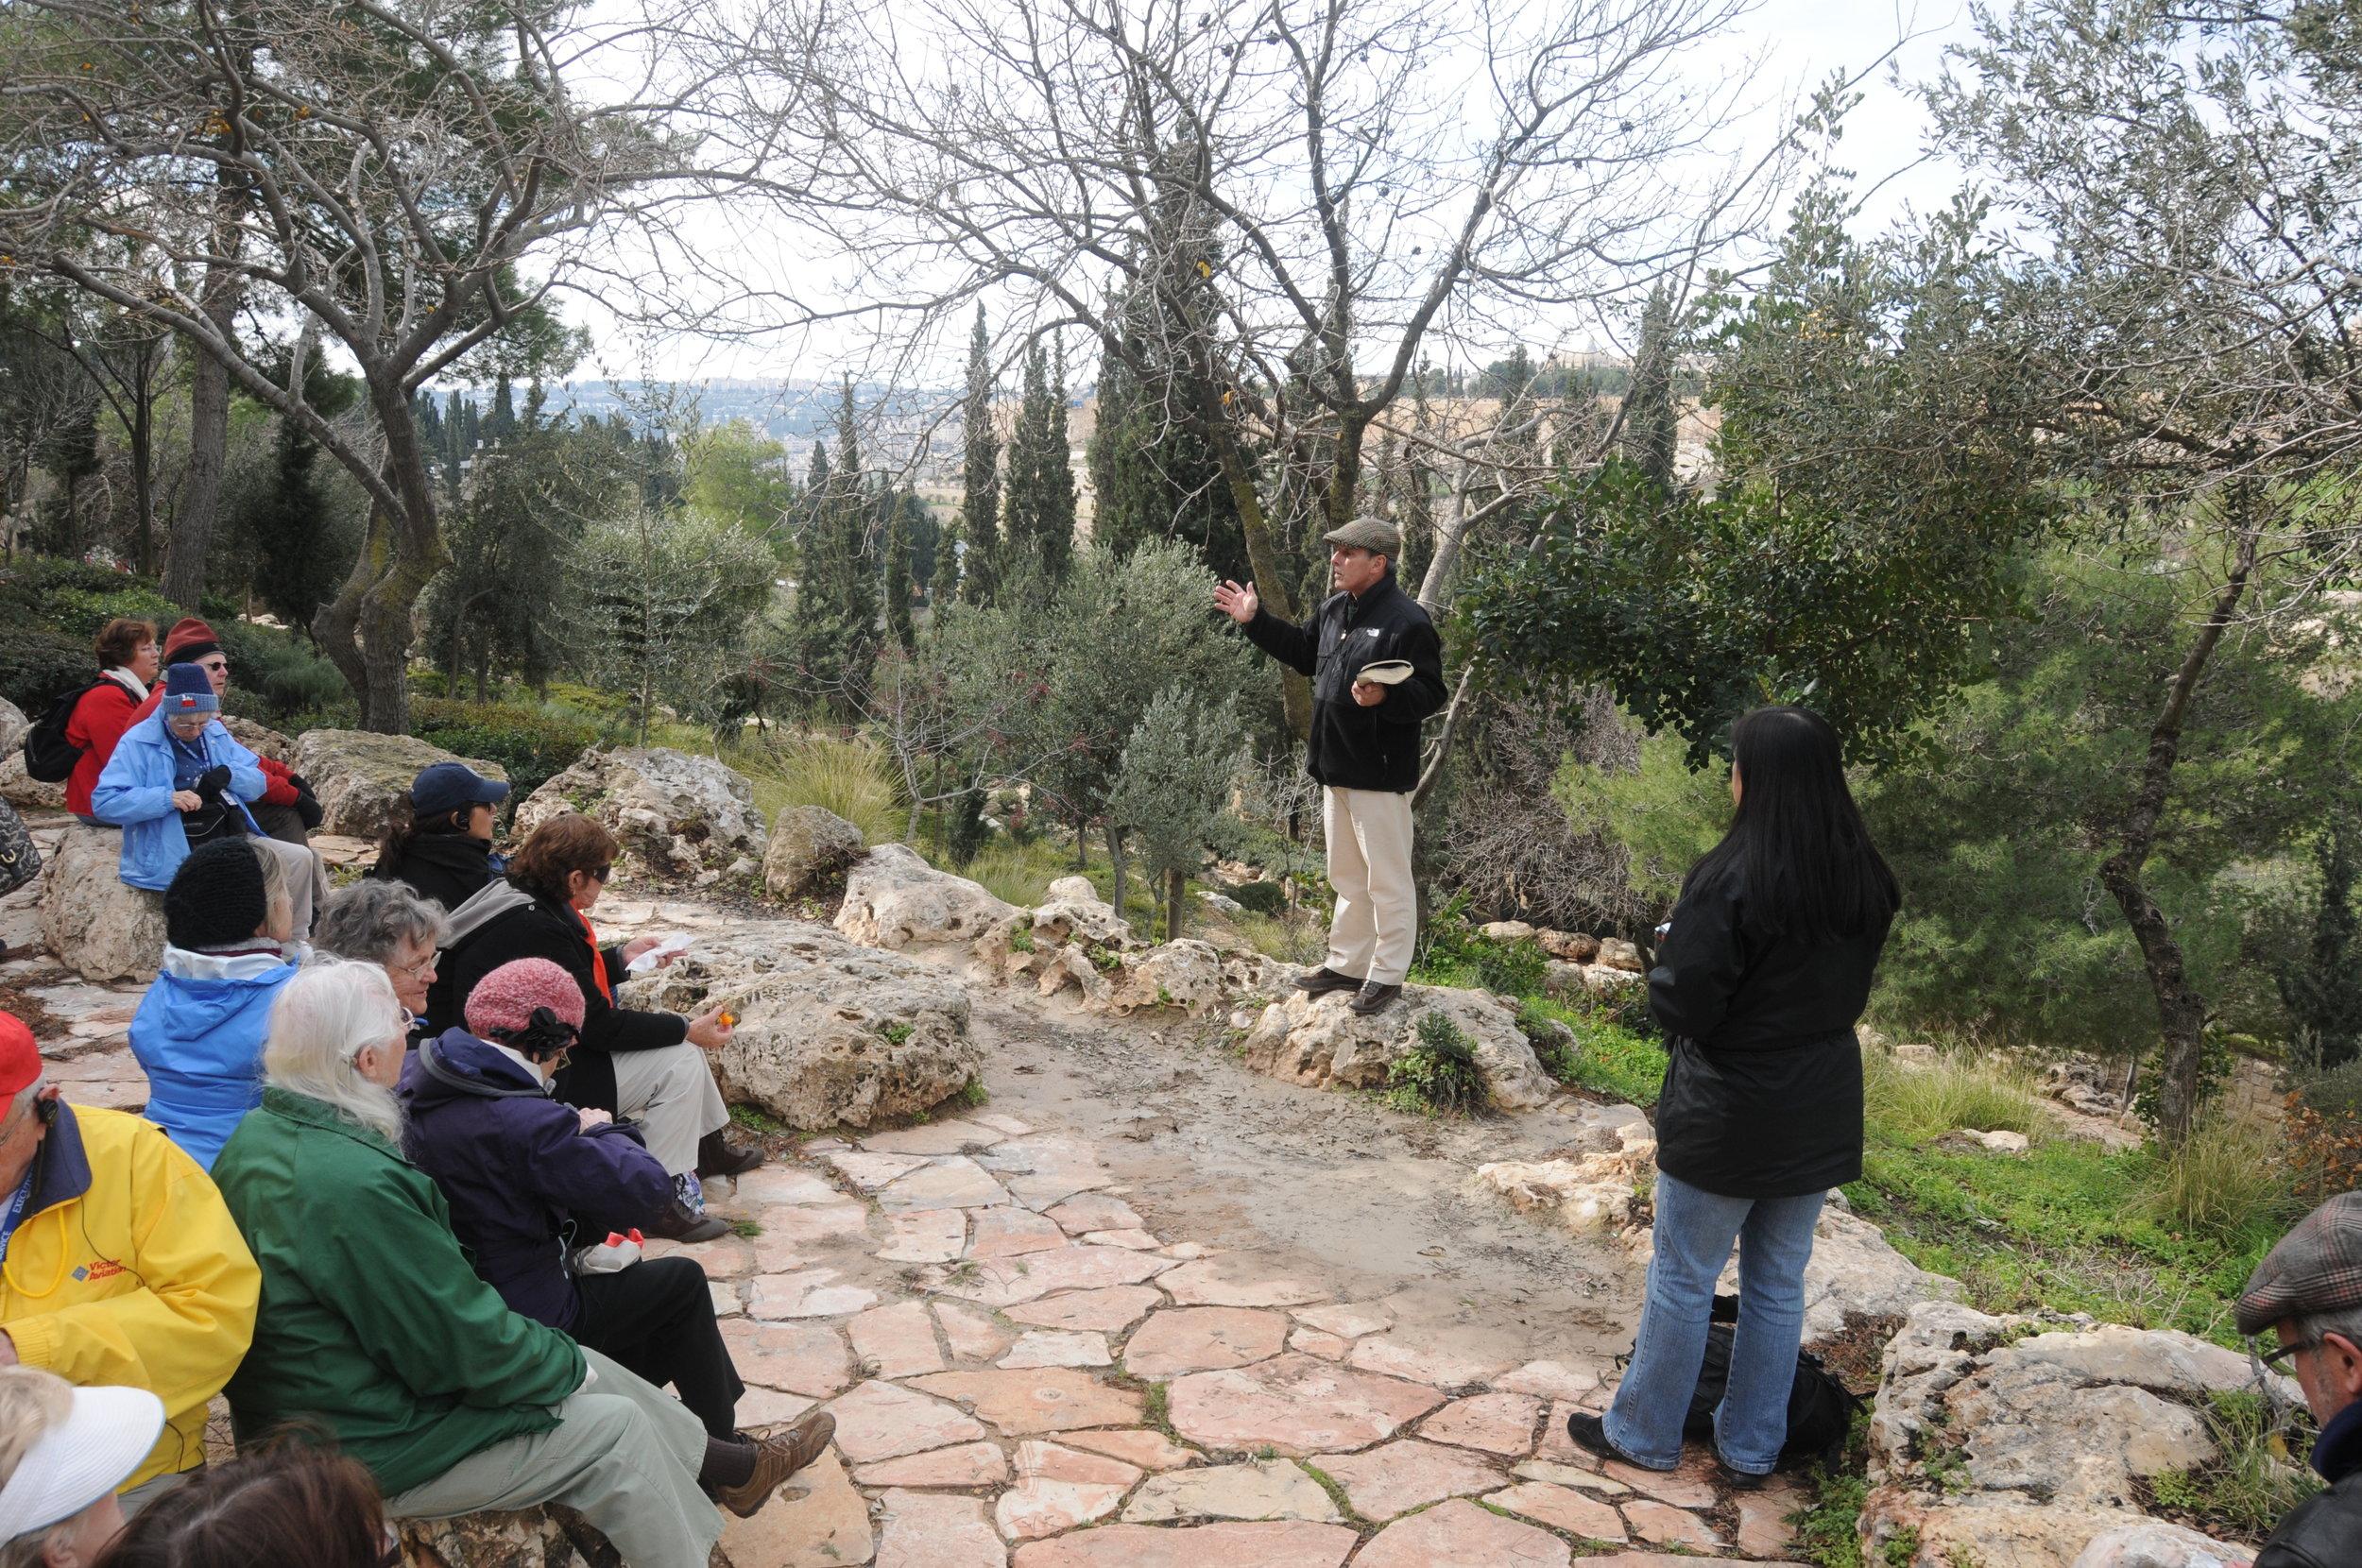 Dr. Creasy teaches in the Garden of Gethsemane.